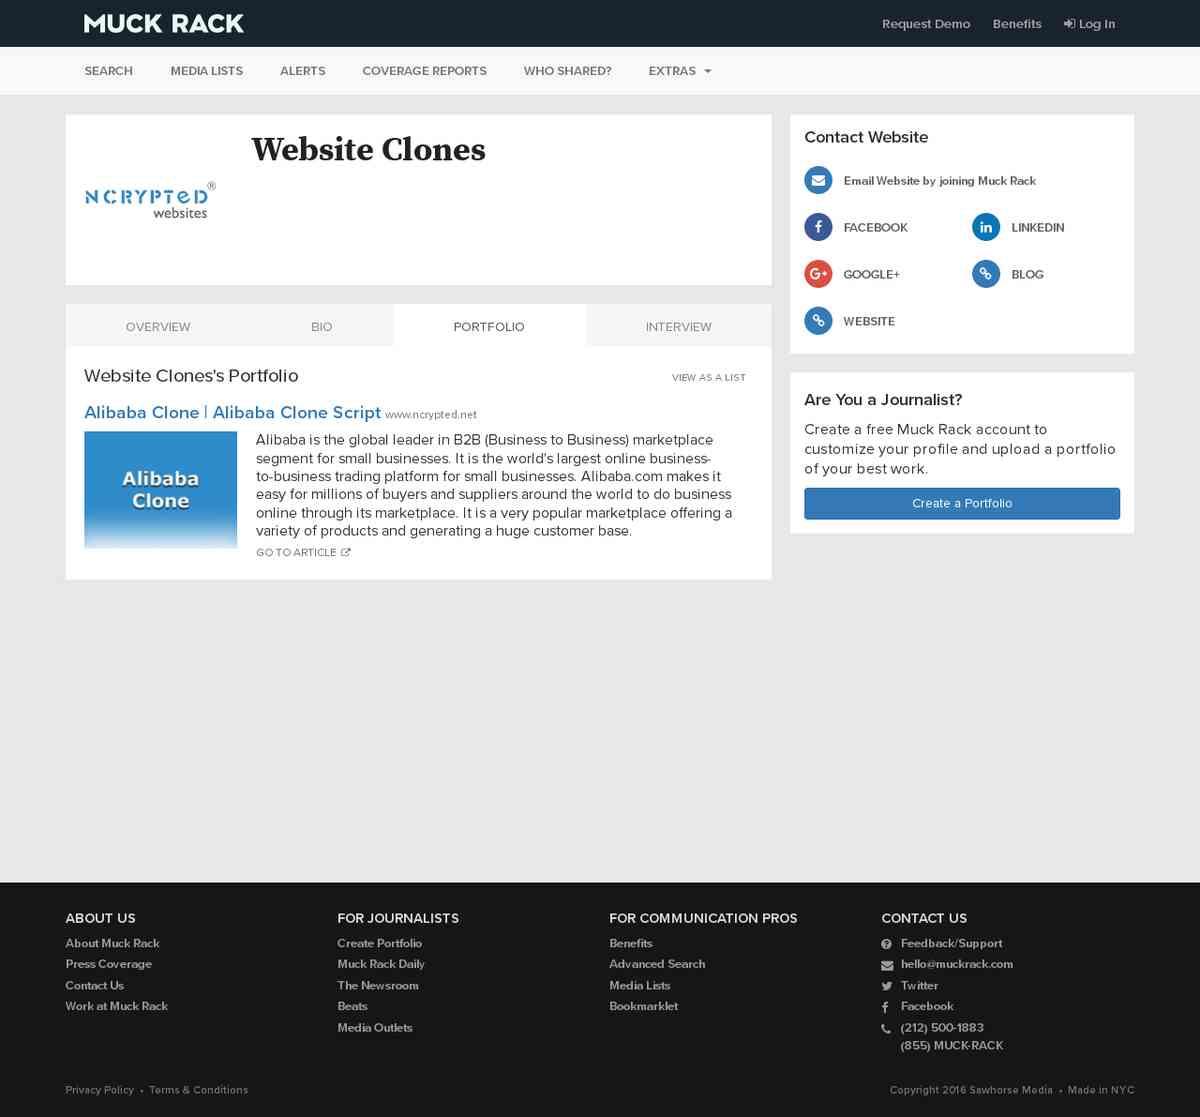 muckrack.com/website-clones/portfolio/KQv/alibaba-clone-alibaba-clone-script